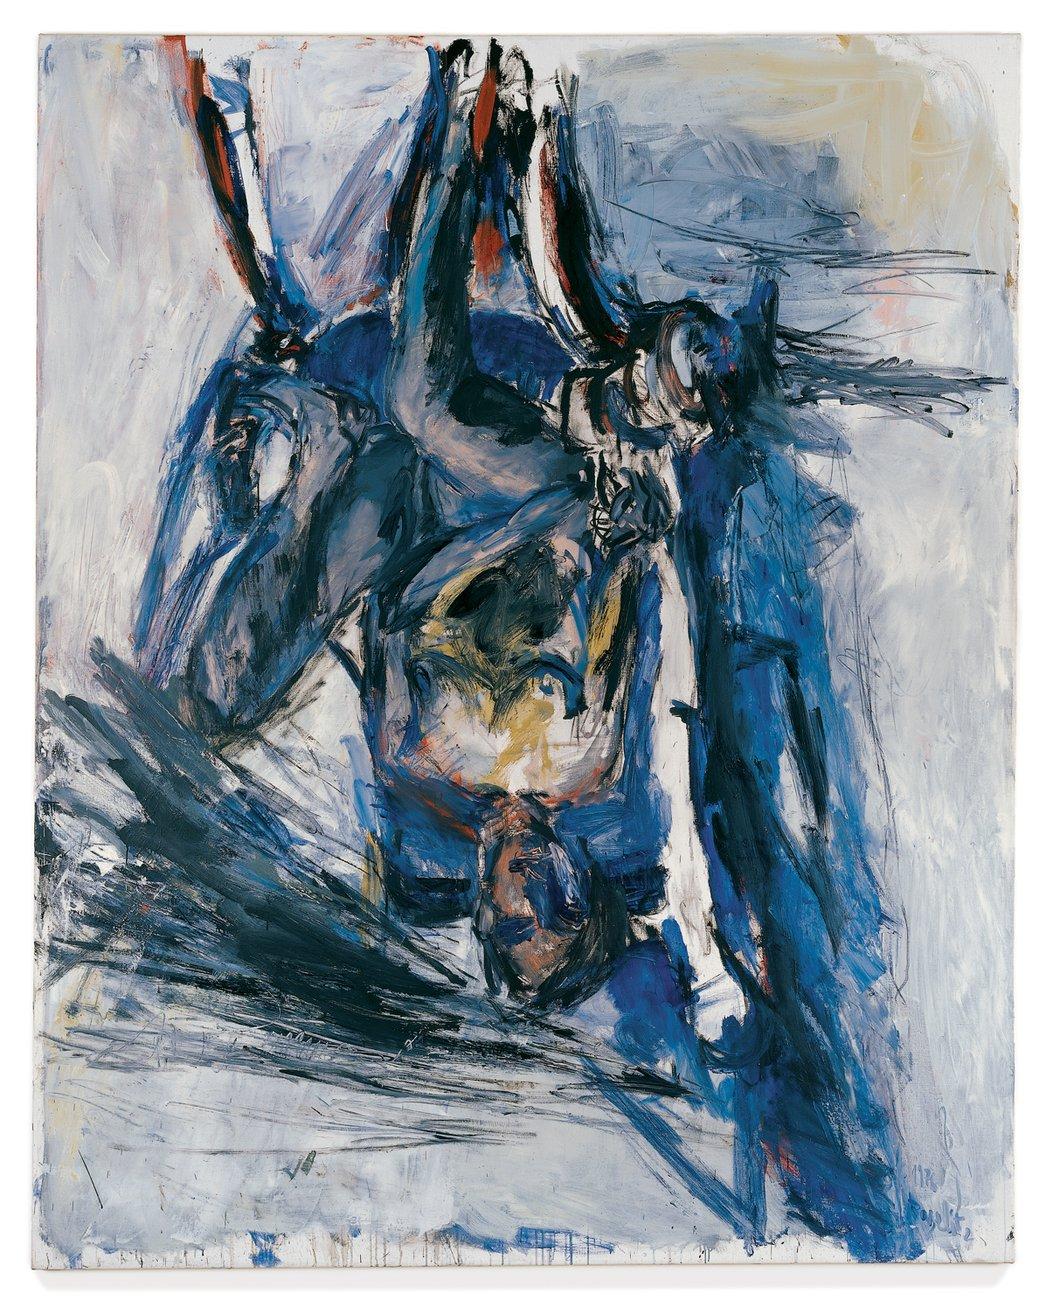 Artwork image, Georg Baselitz Elke im Lehnstuhl (Elke in Armchair)